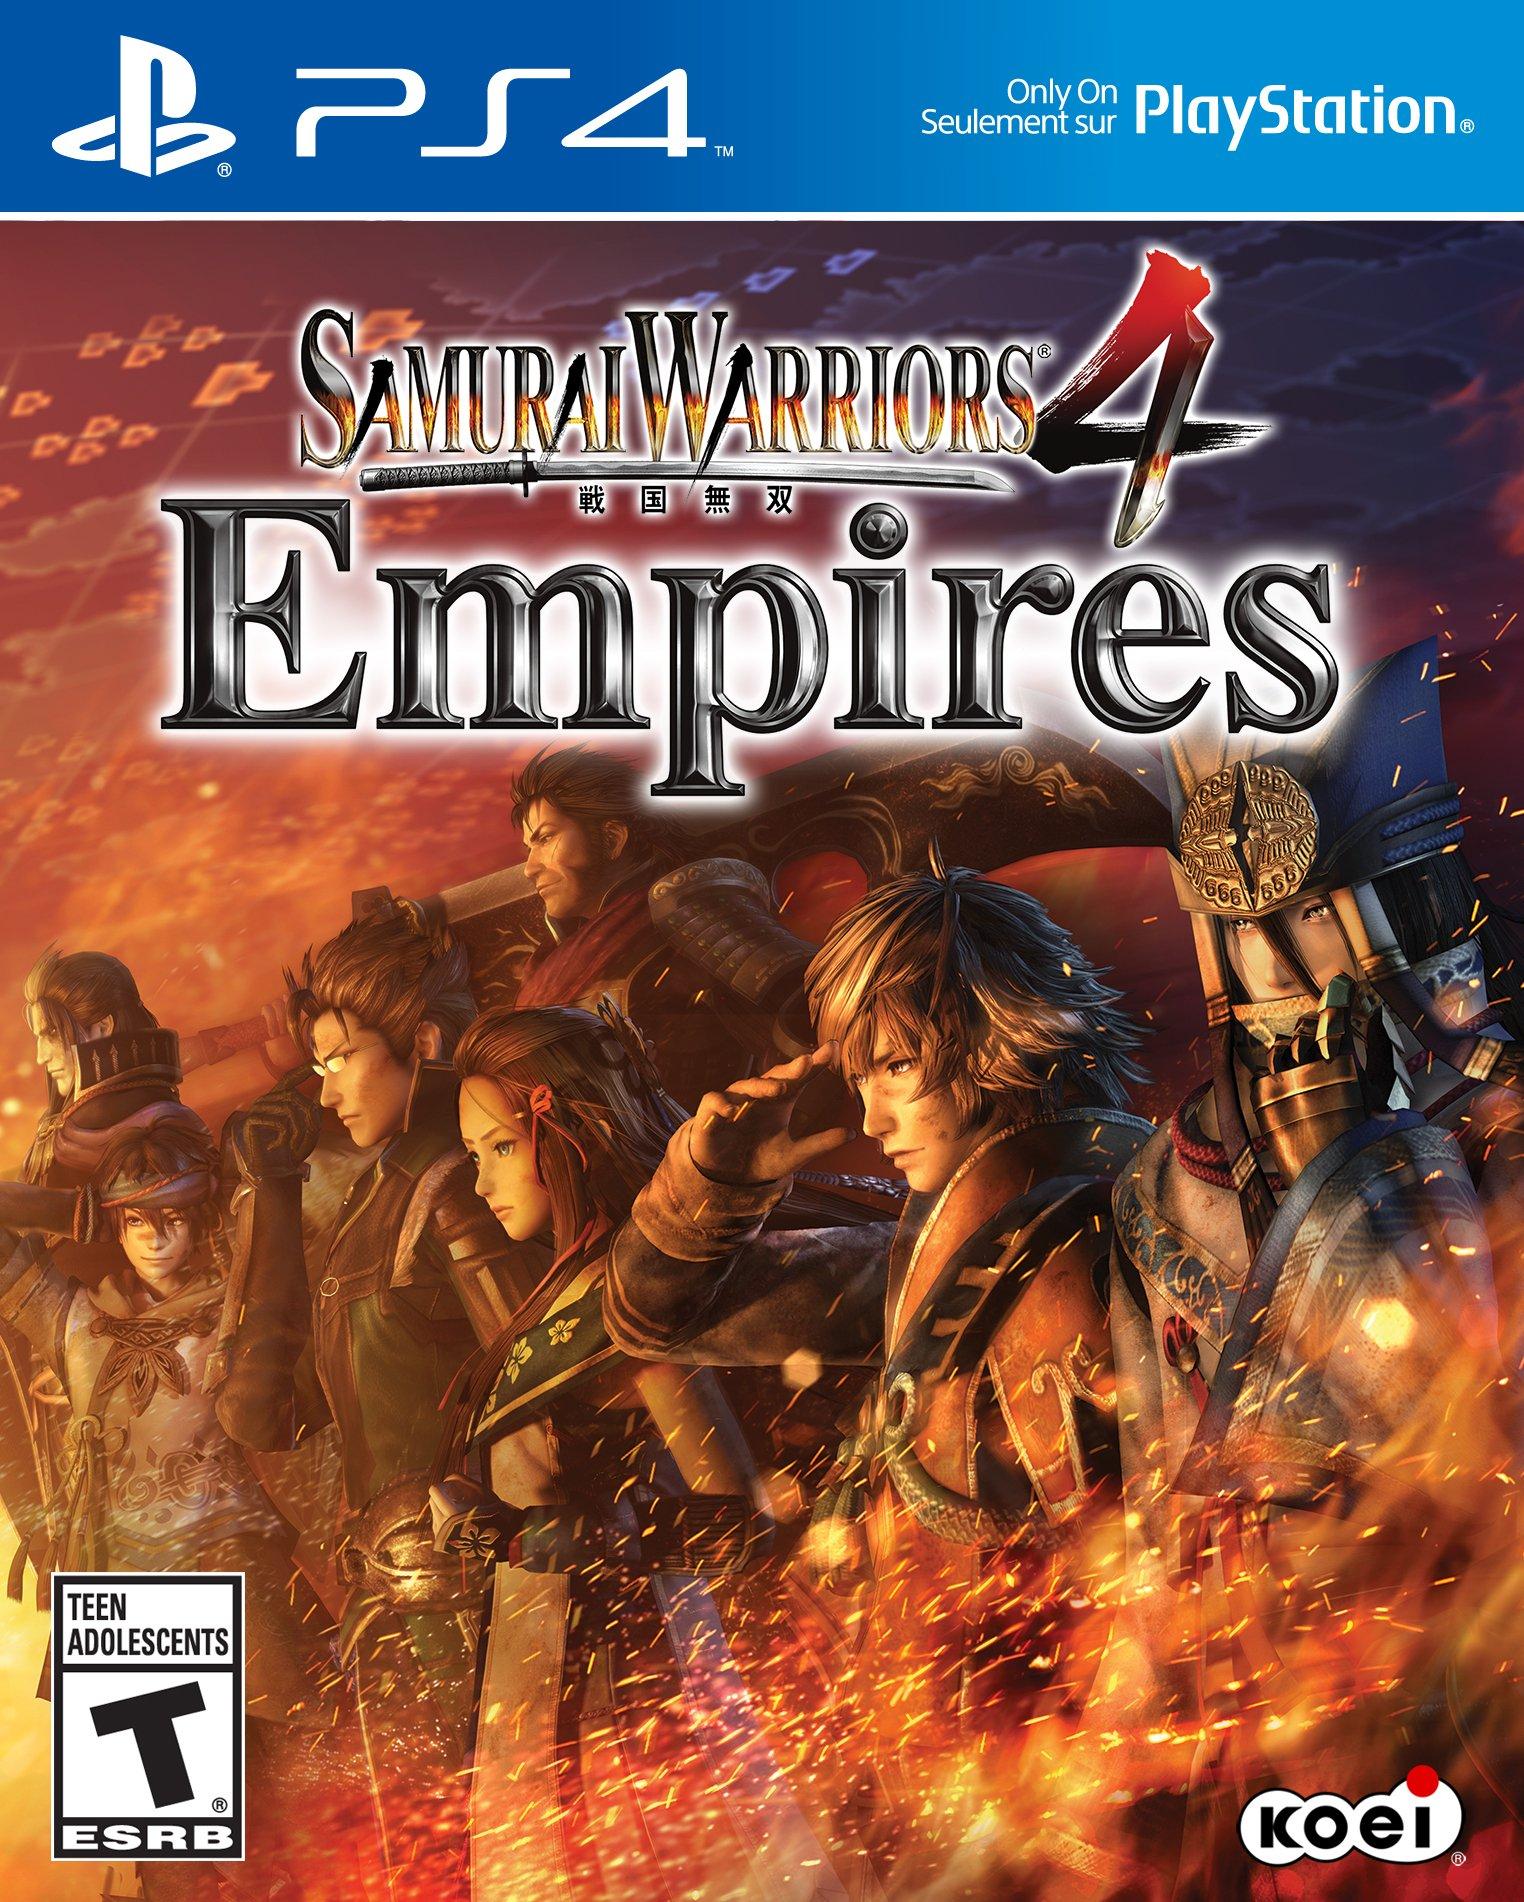 Samurai Warriors 4 Empires Release Date (PS4